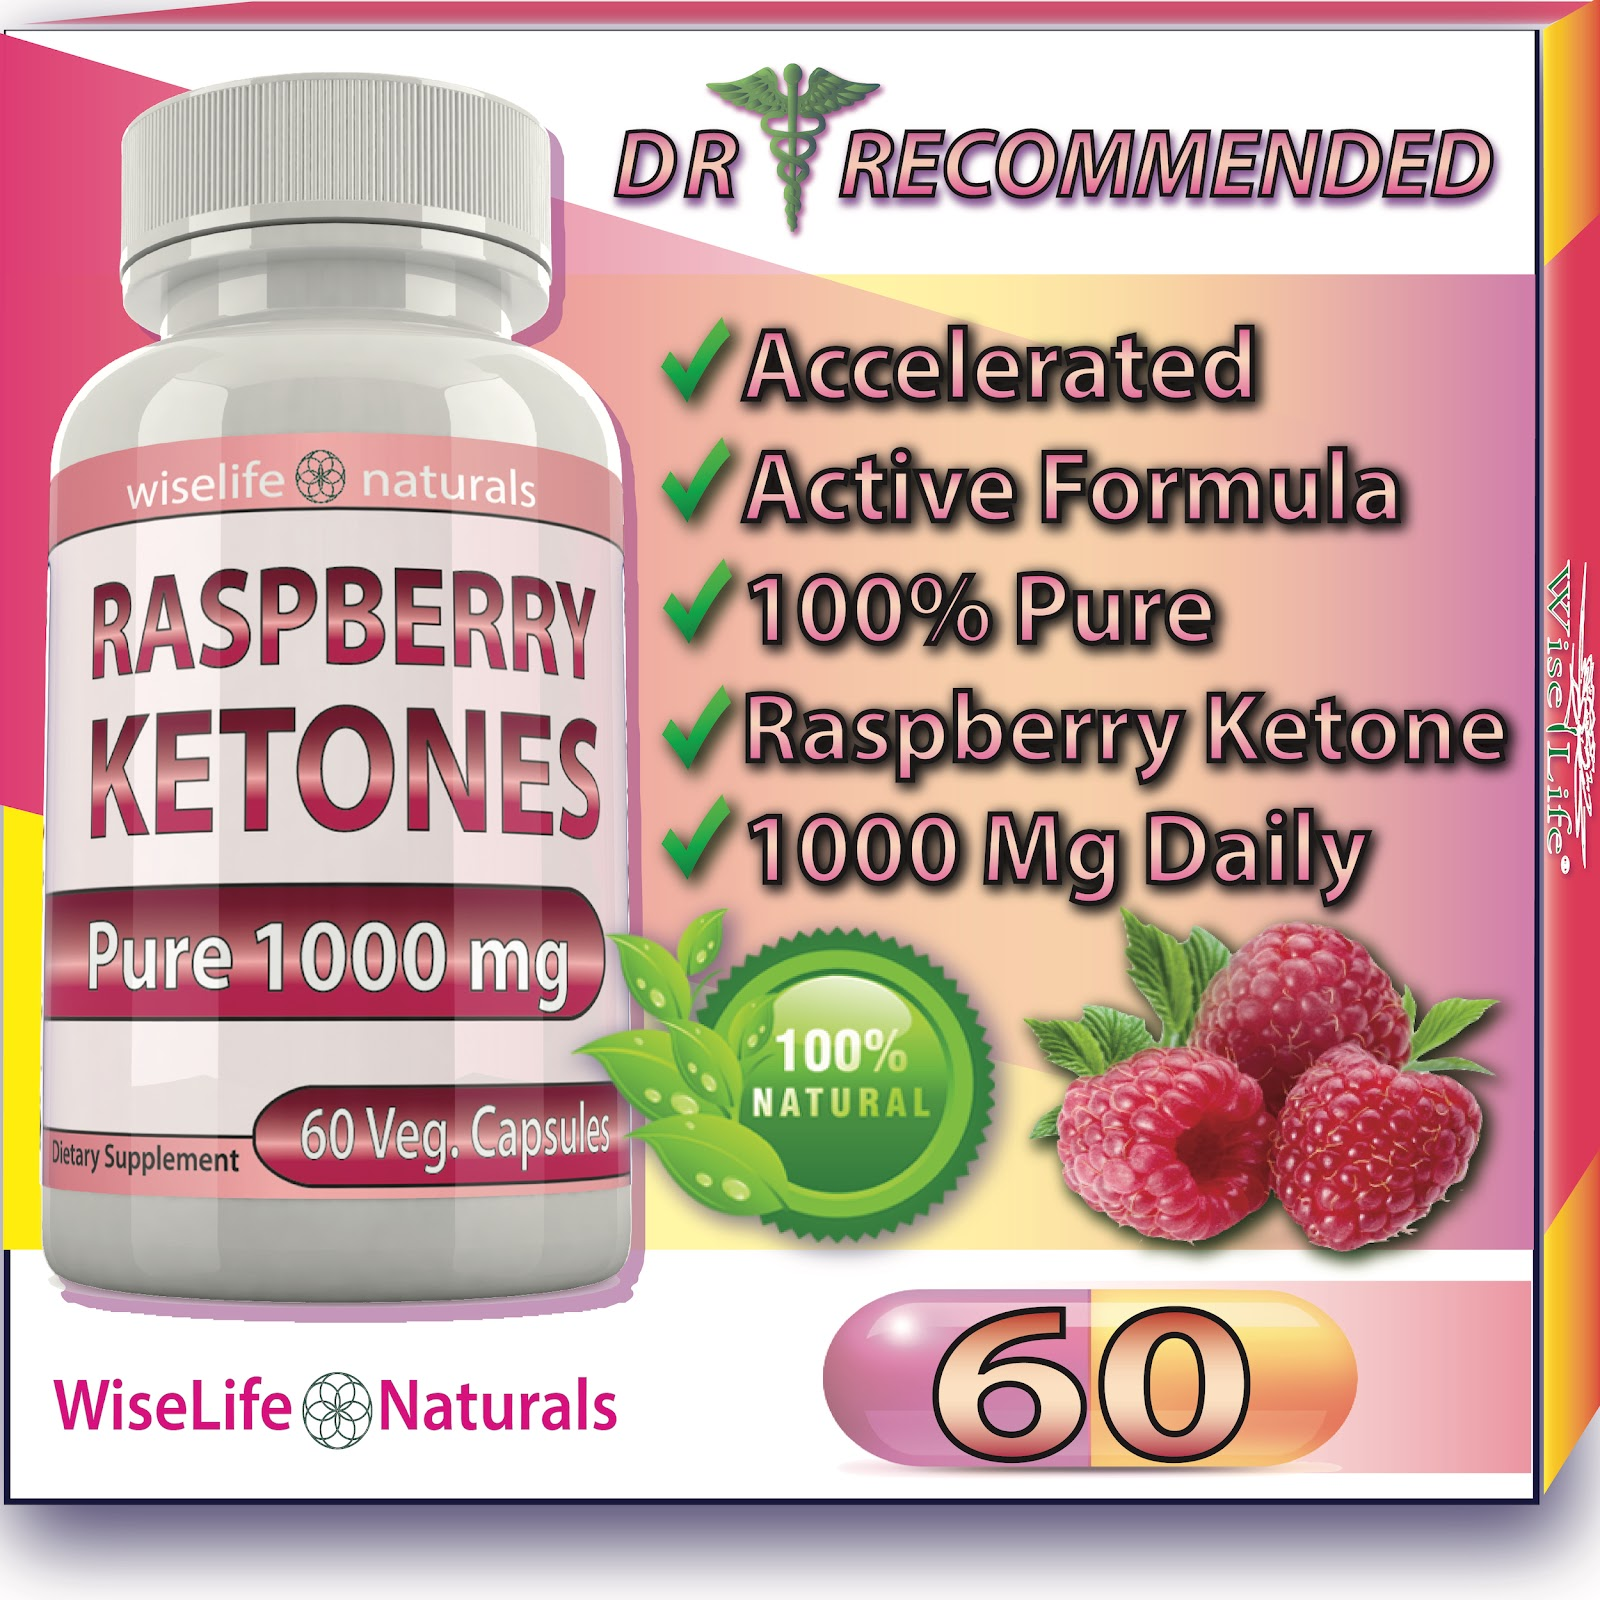 box ads wln raspberry-ketones-60-05.jpg